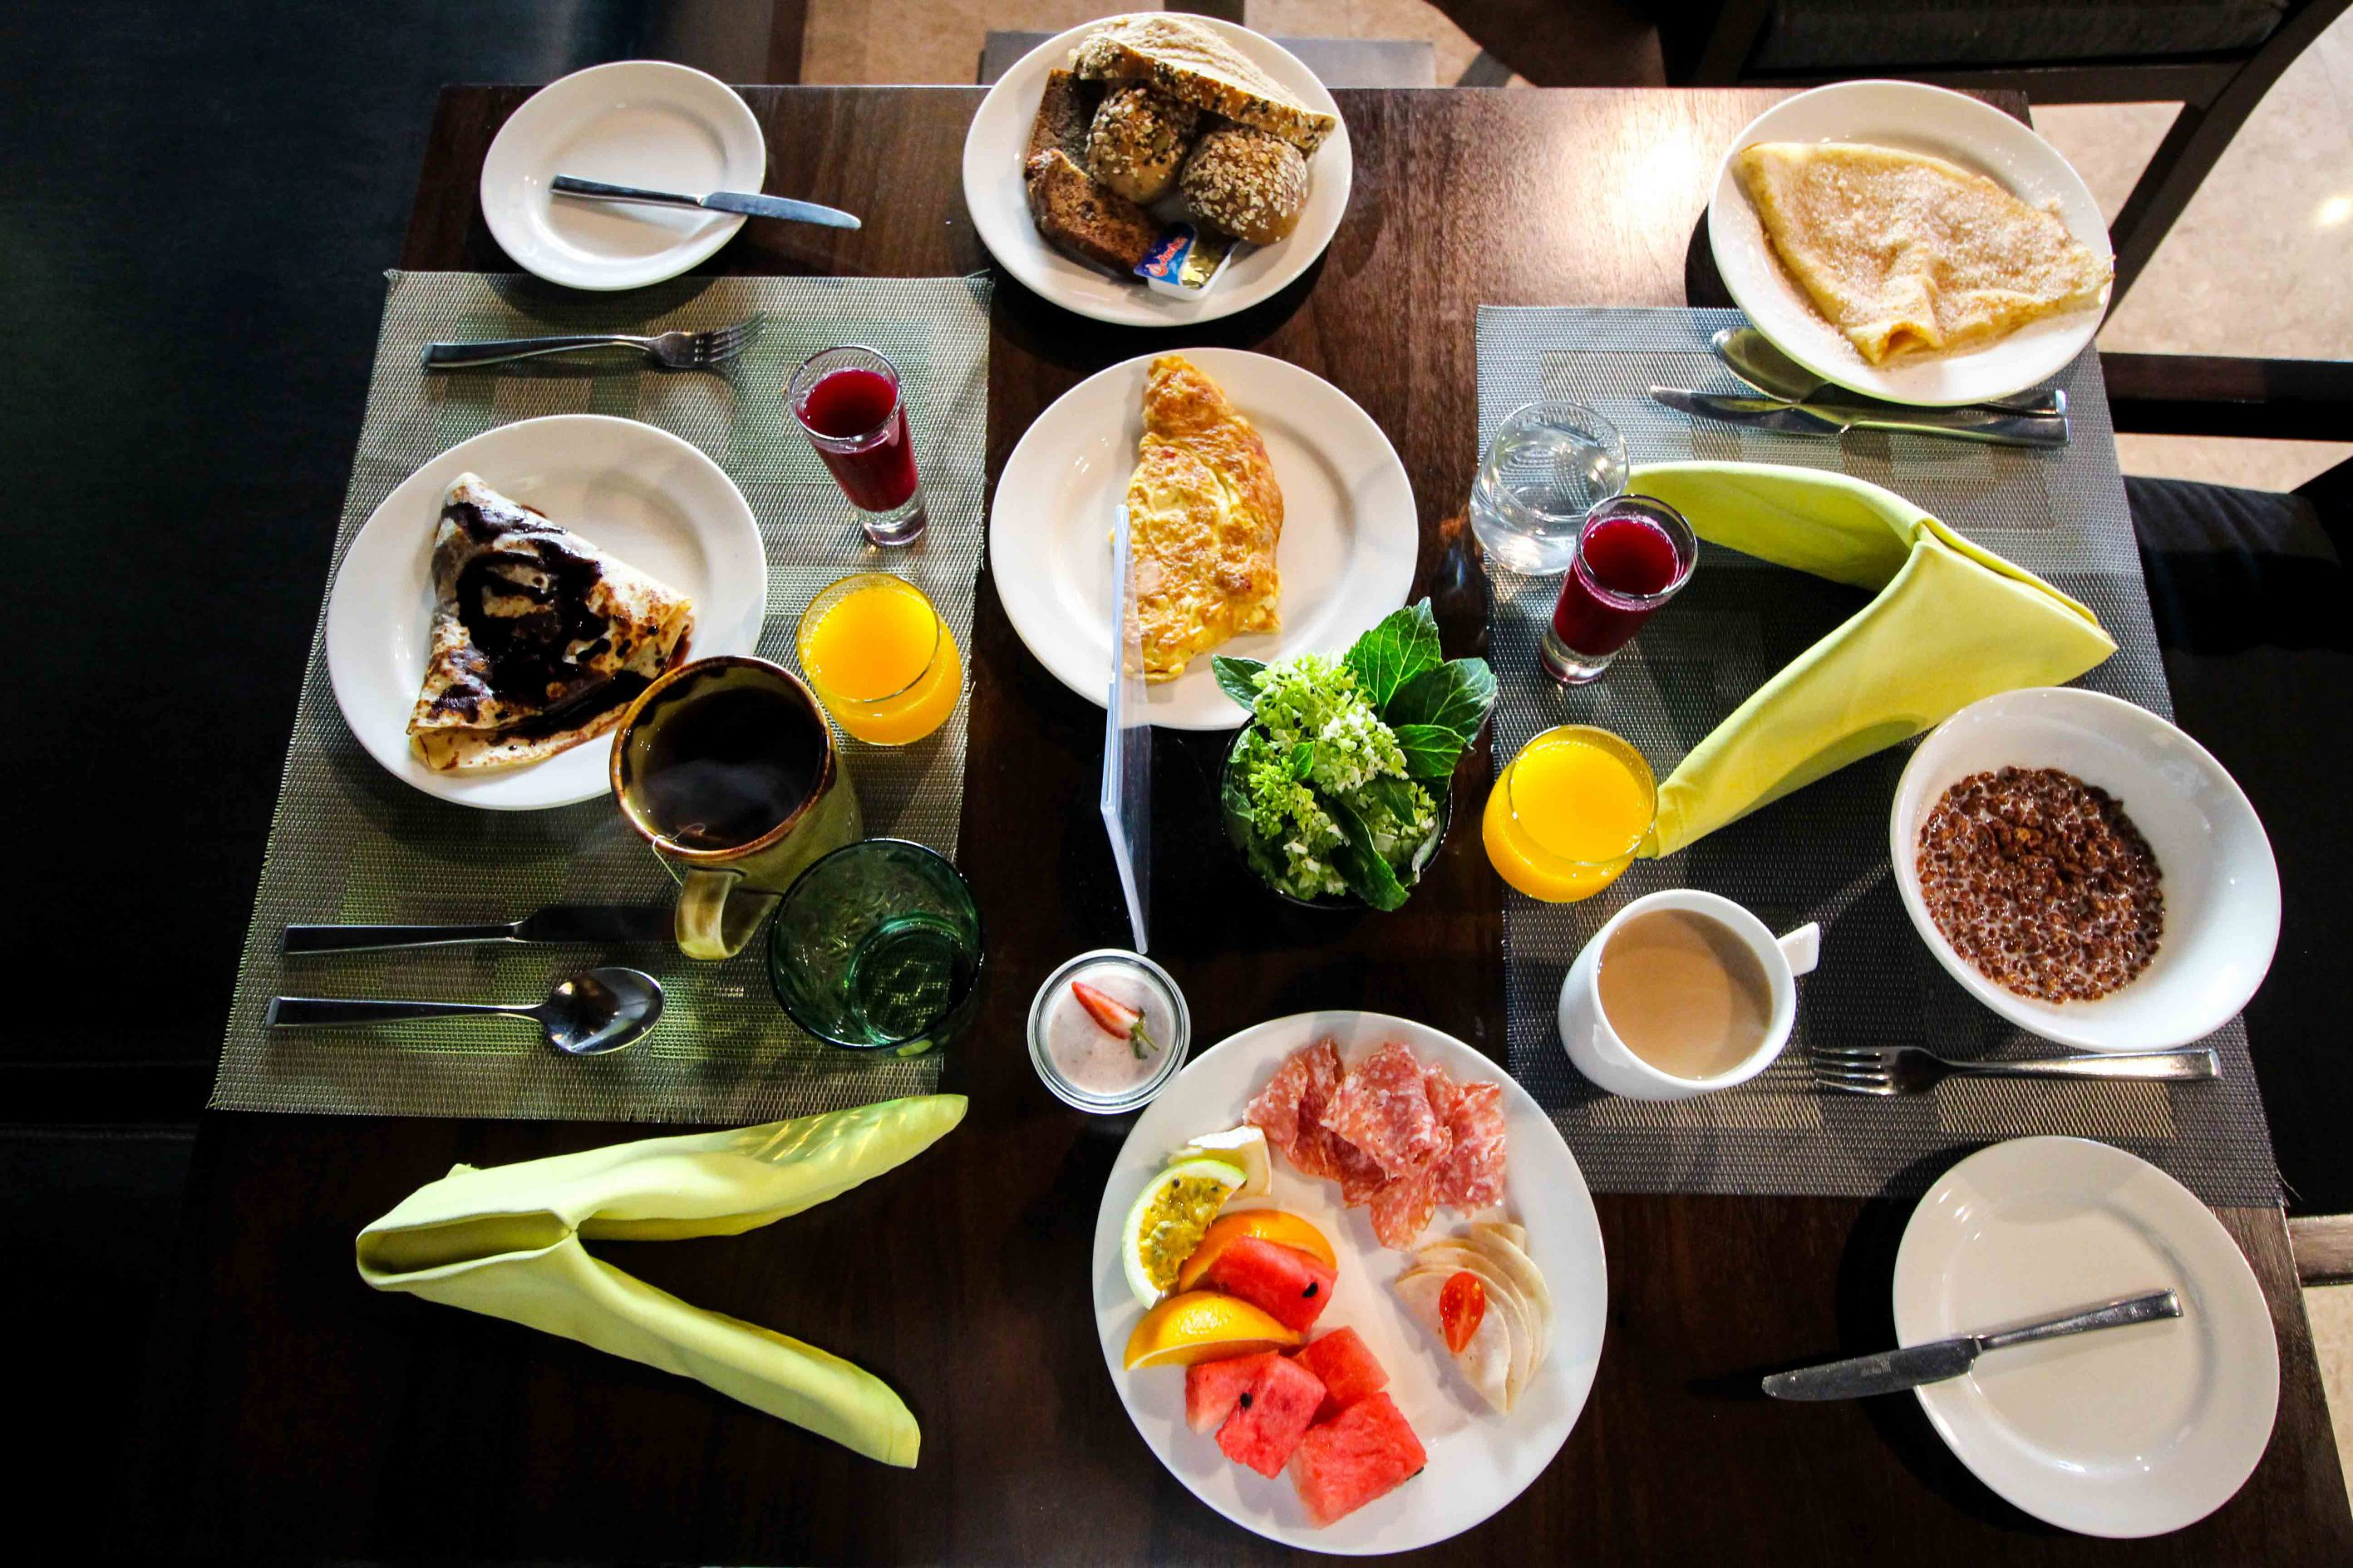 Mövenpick Colombo Hotel Frühstück Früchte Crepes müsli Reiseblog Brinisfashionbook Hotel Sri Lanka